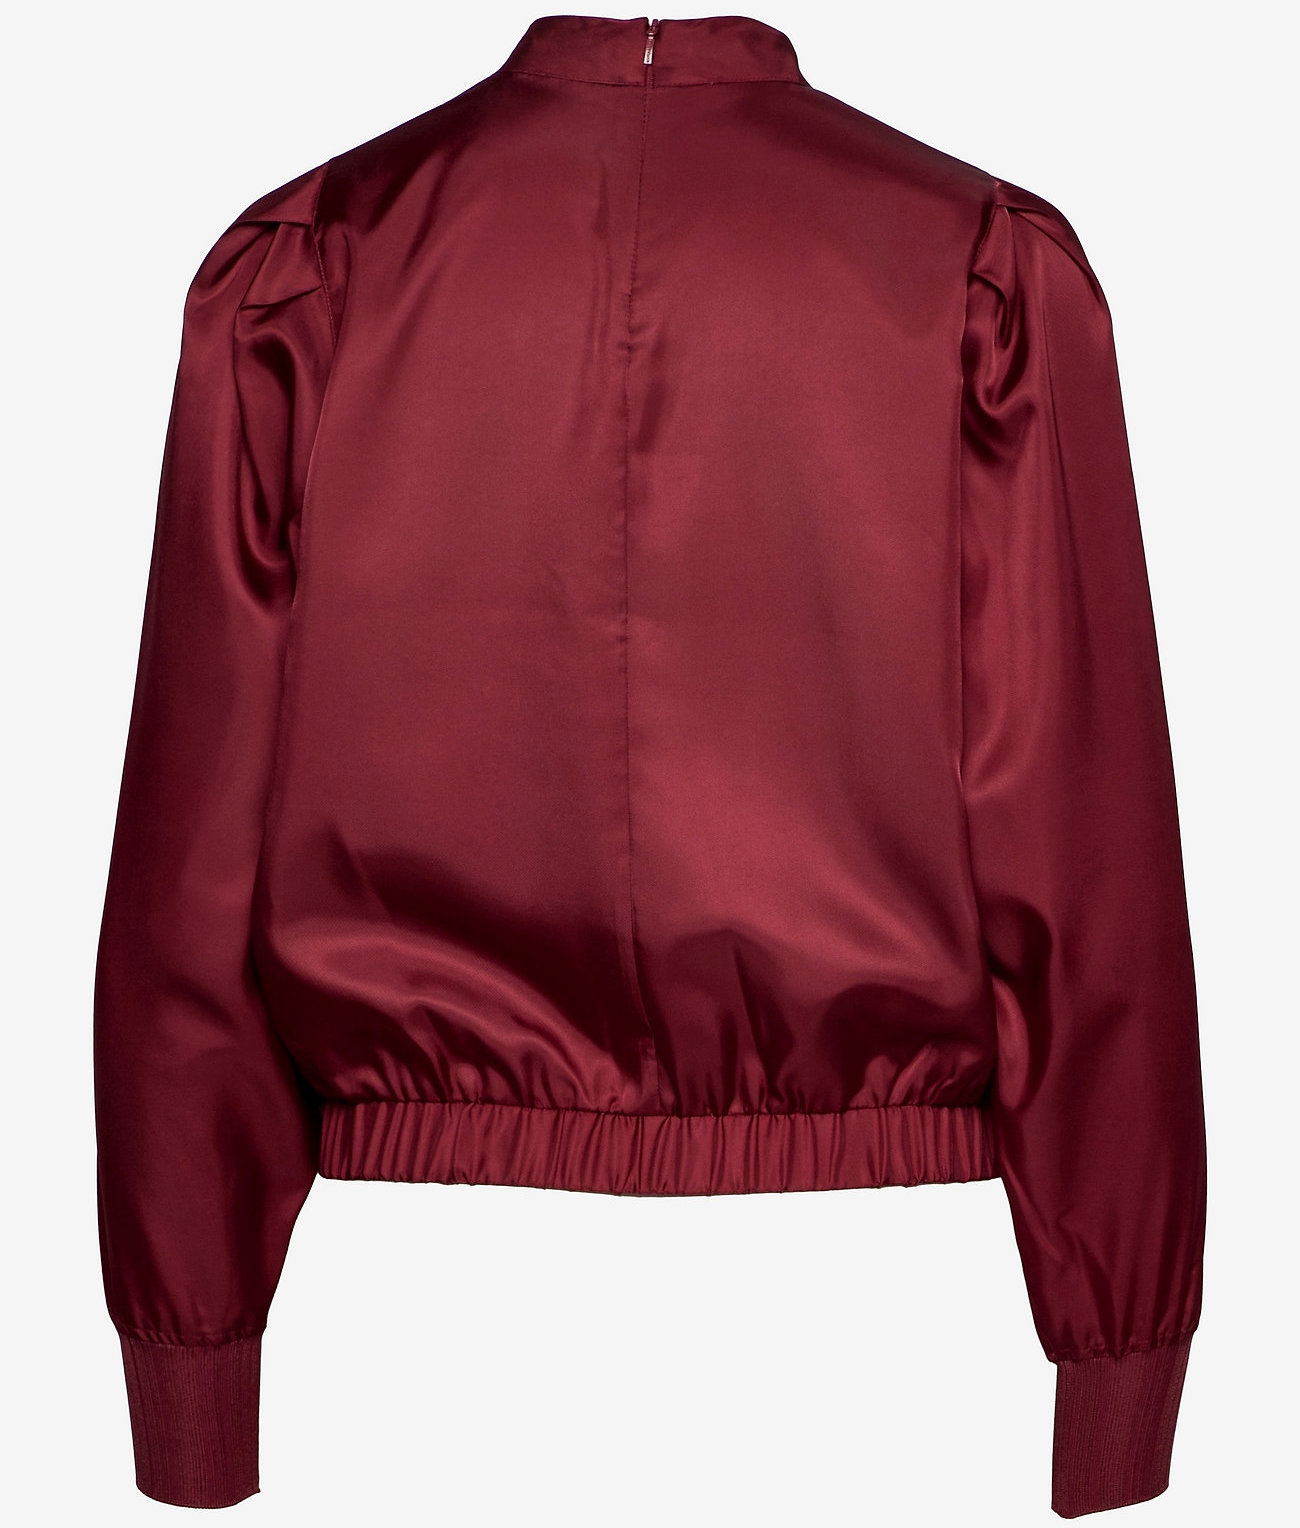 Scotch & Soda Dames blouse, rood